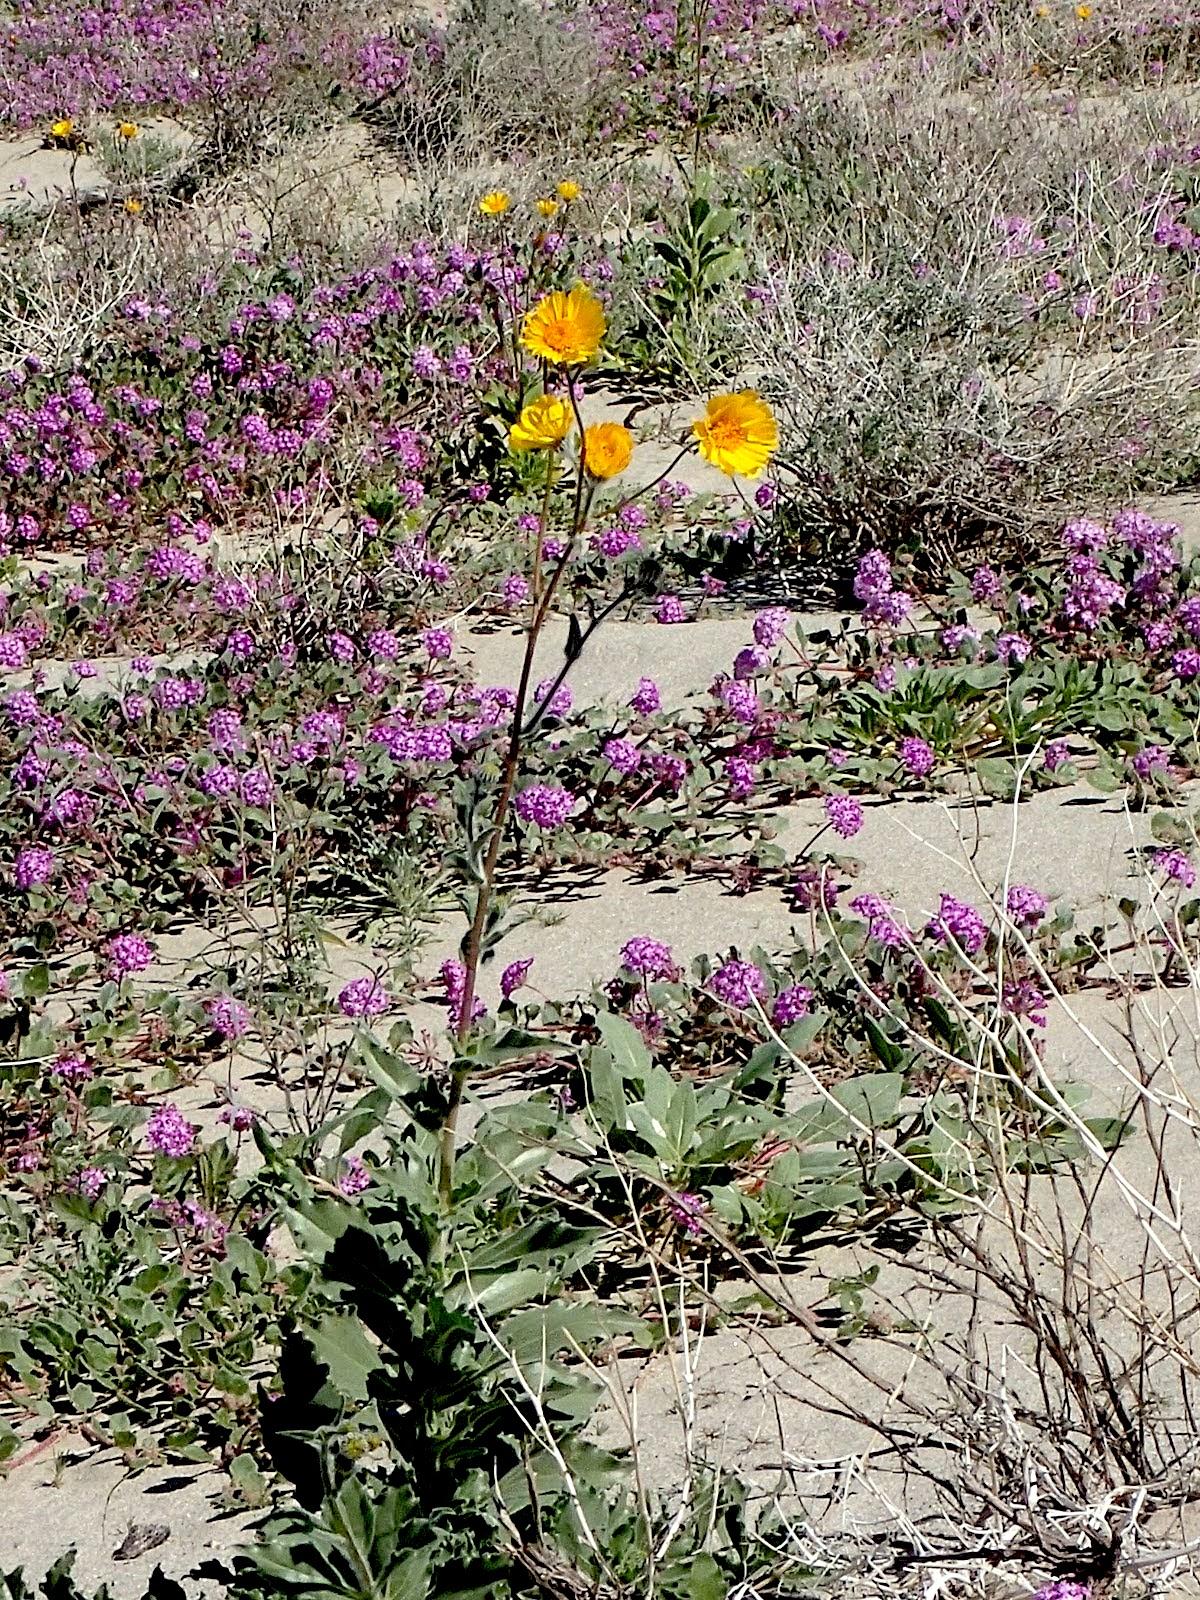 Hairy Desert Sunflower (Geraea canescens) and Sand Verbena (Abronia villosa) PC: Lee Gordon